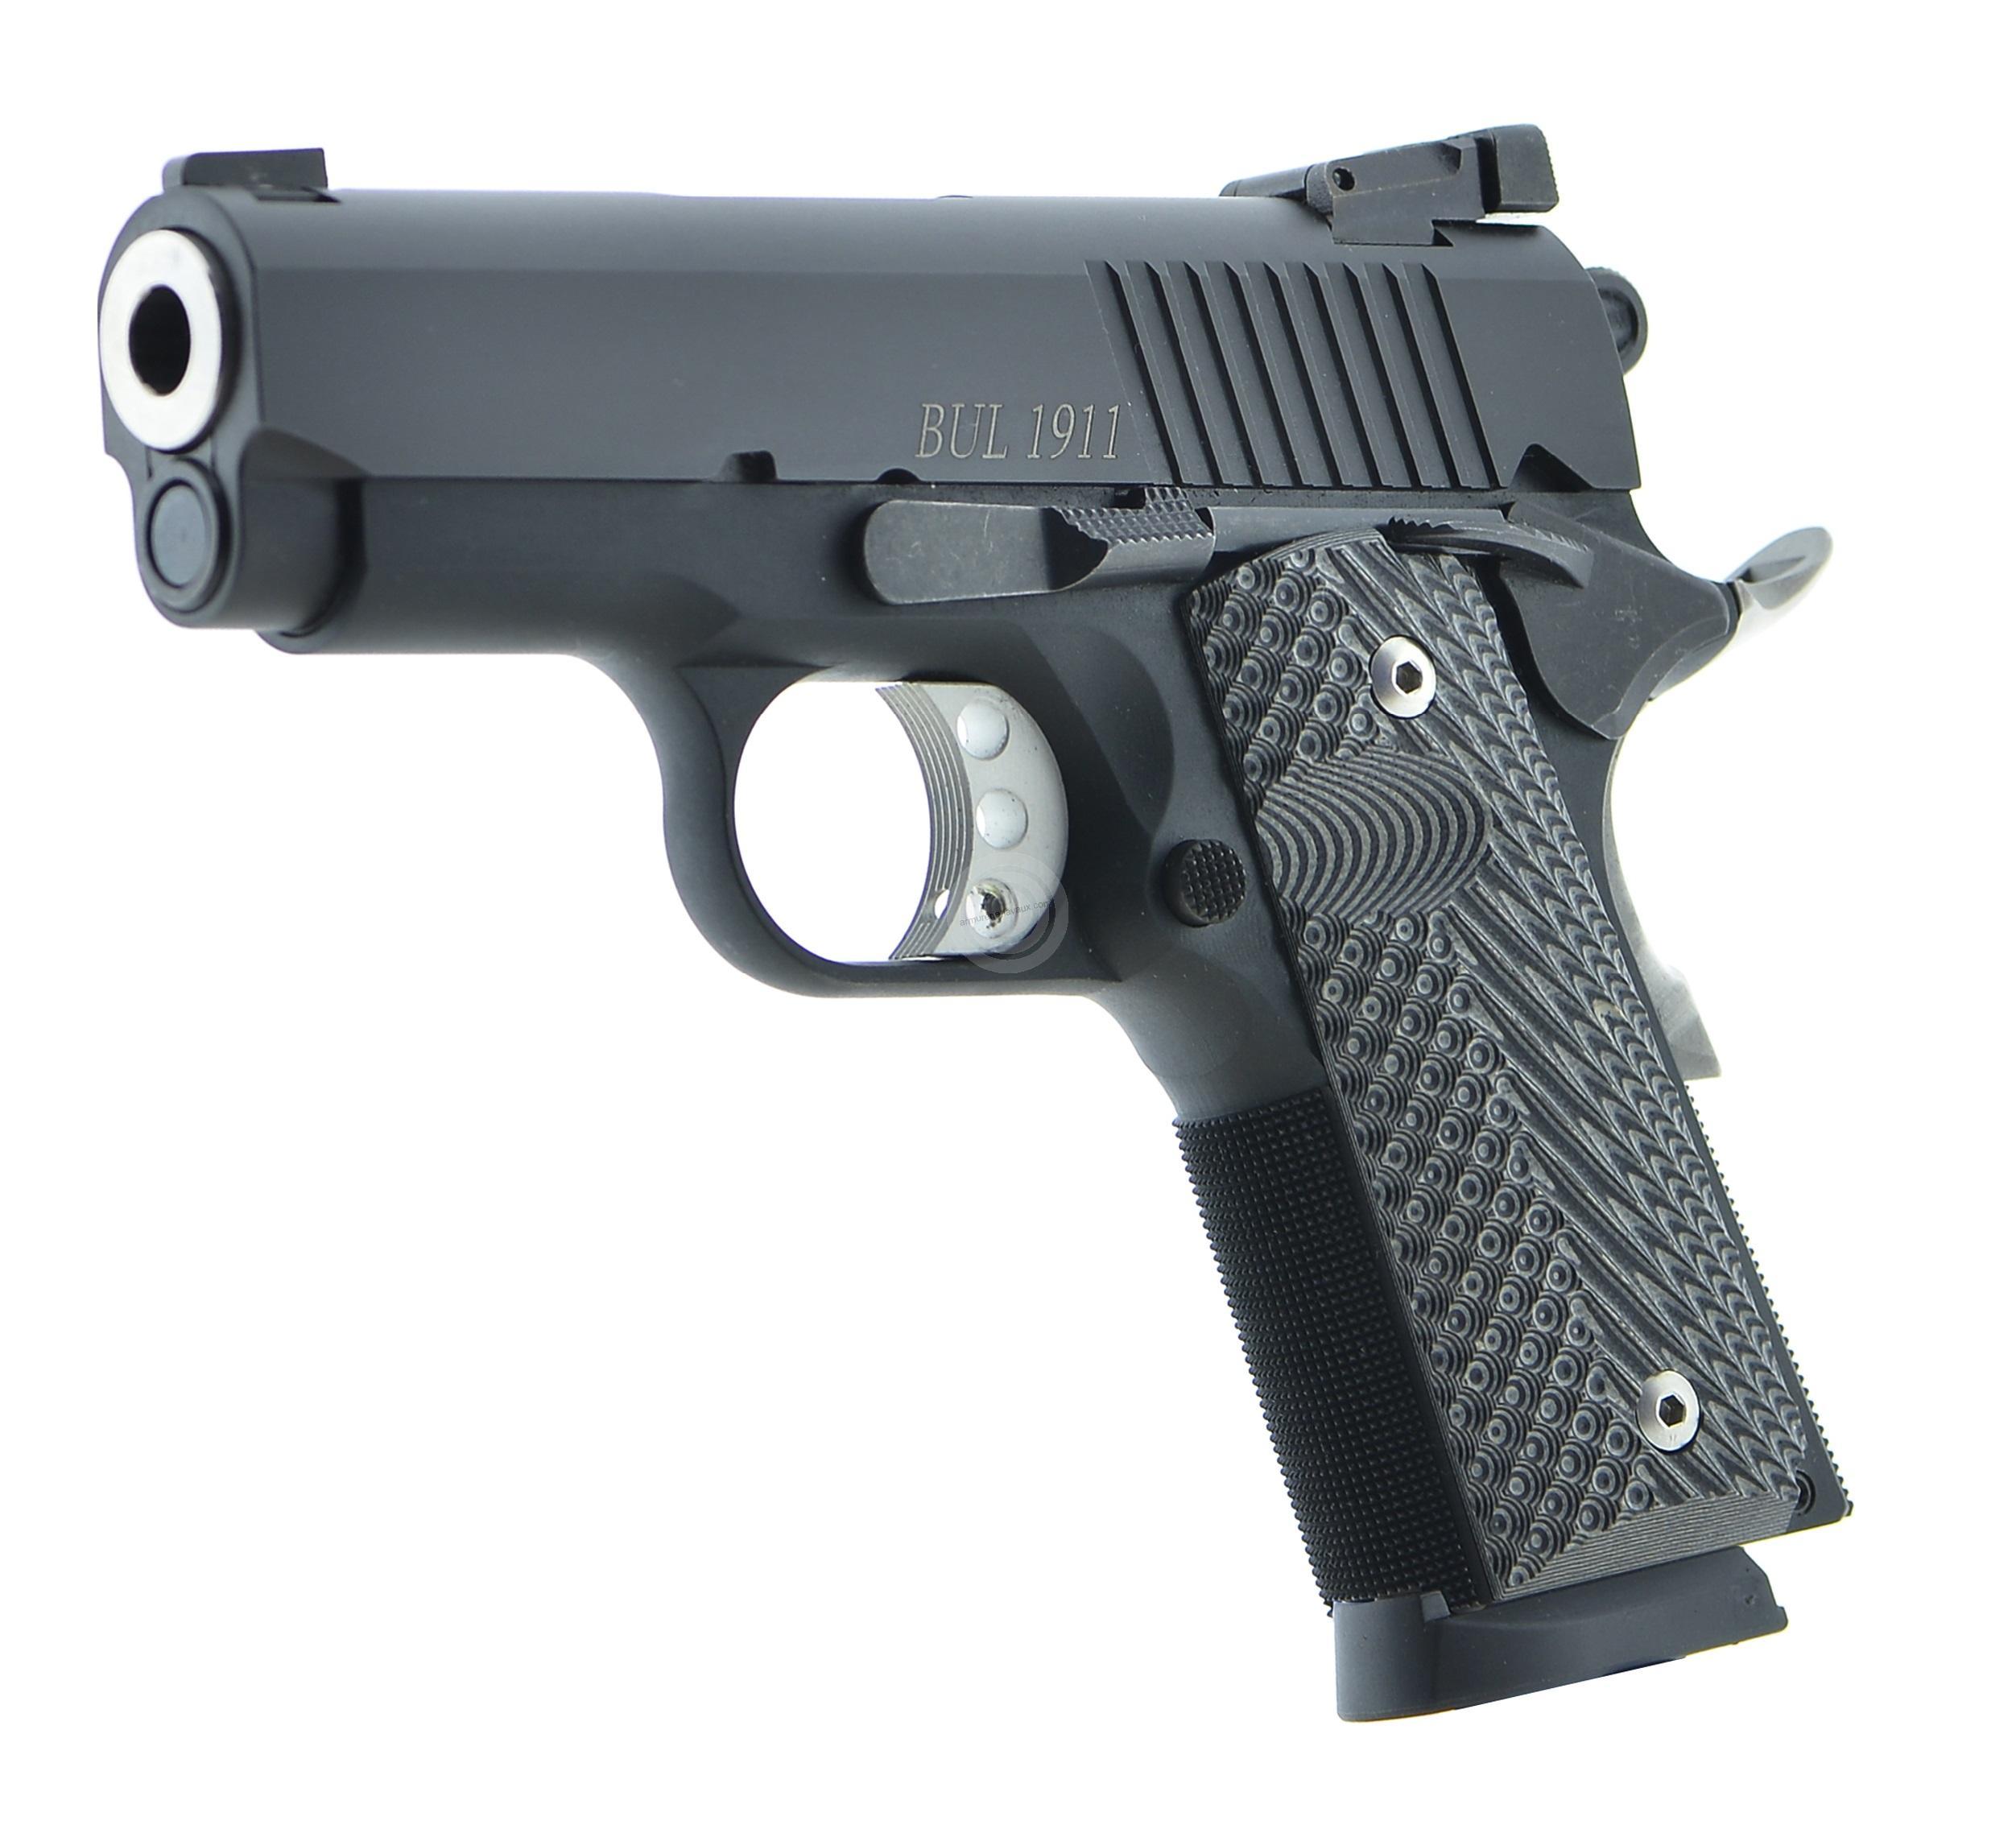 Pistolet BUL 1911 Ultra 3.1